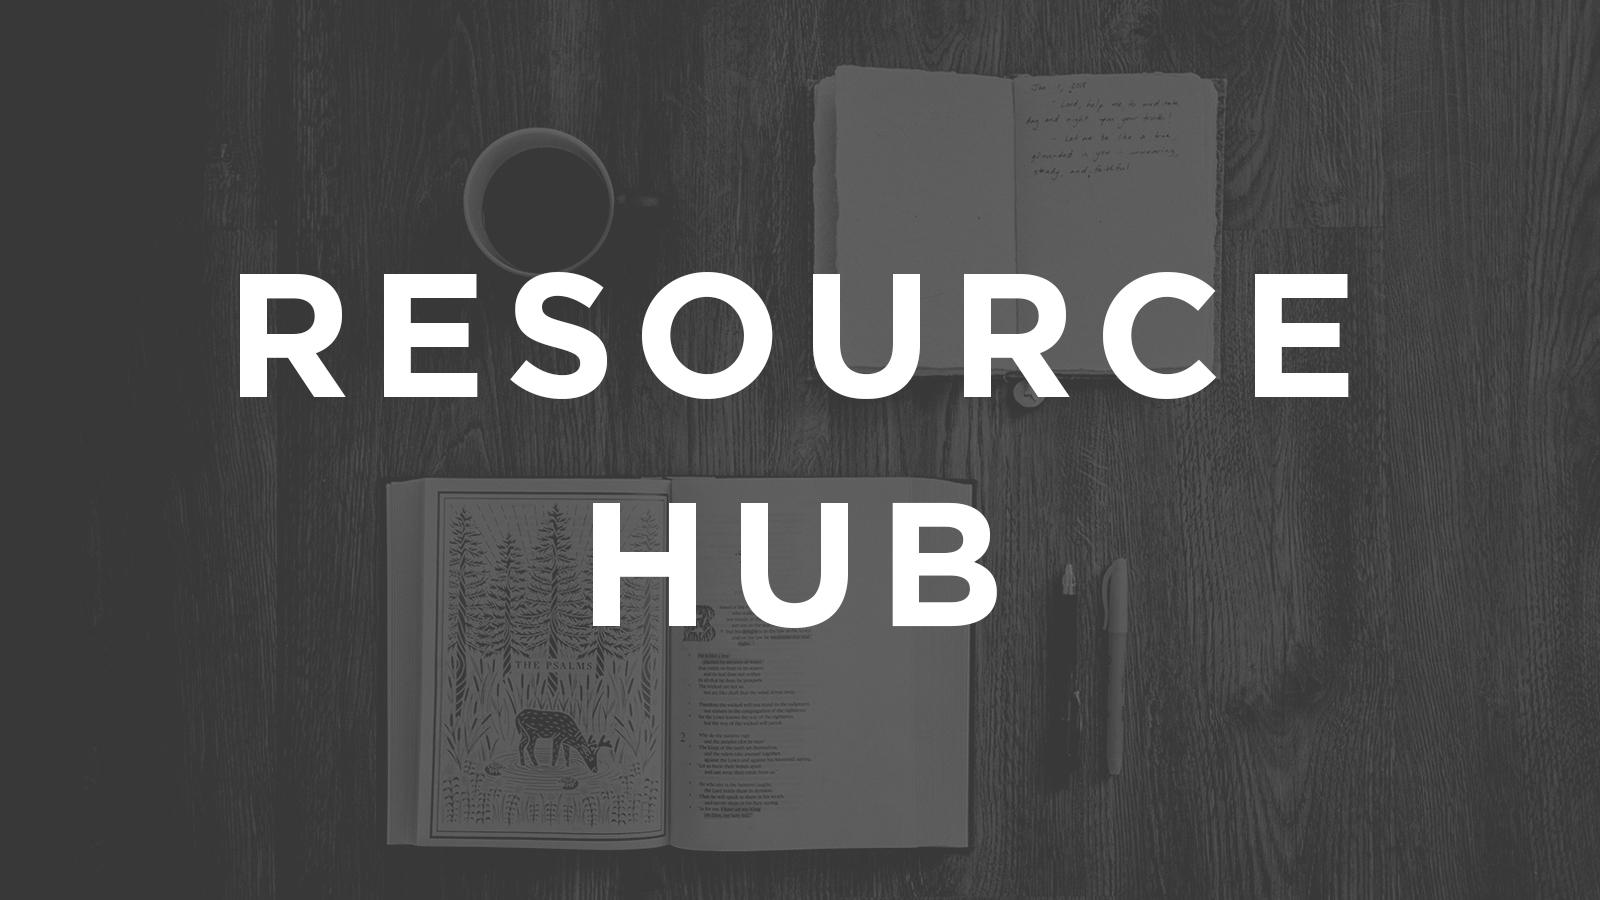 ResourceHub1.jpg